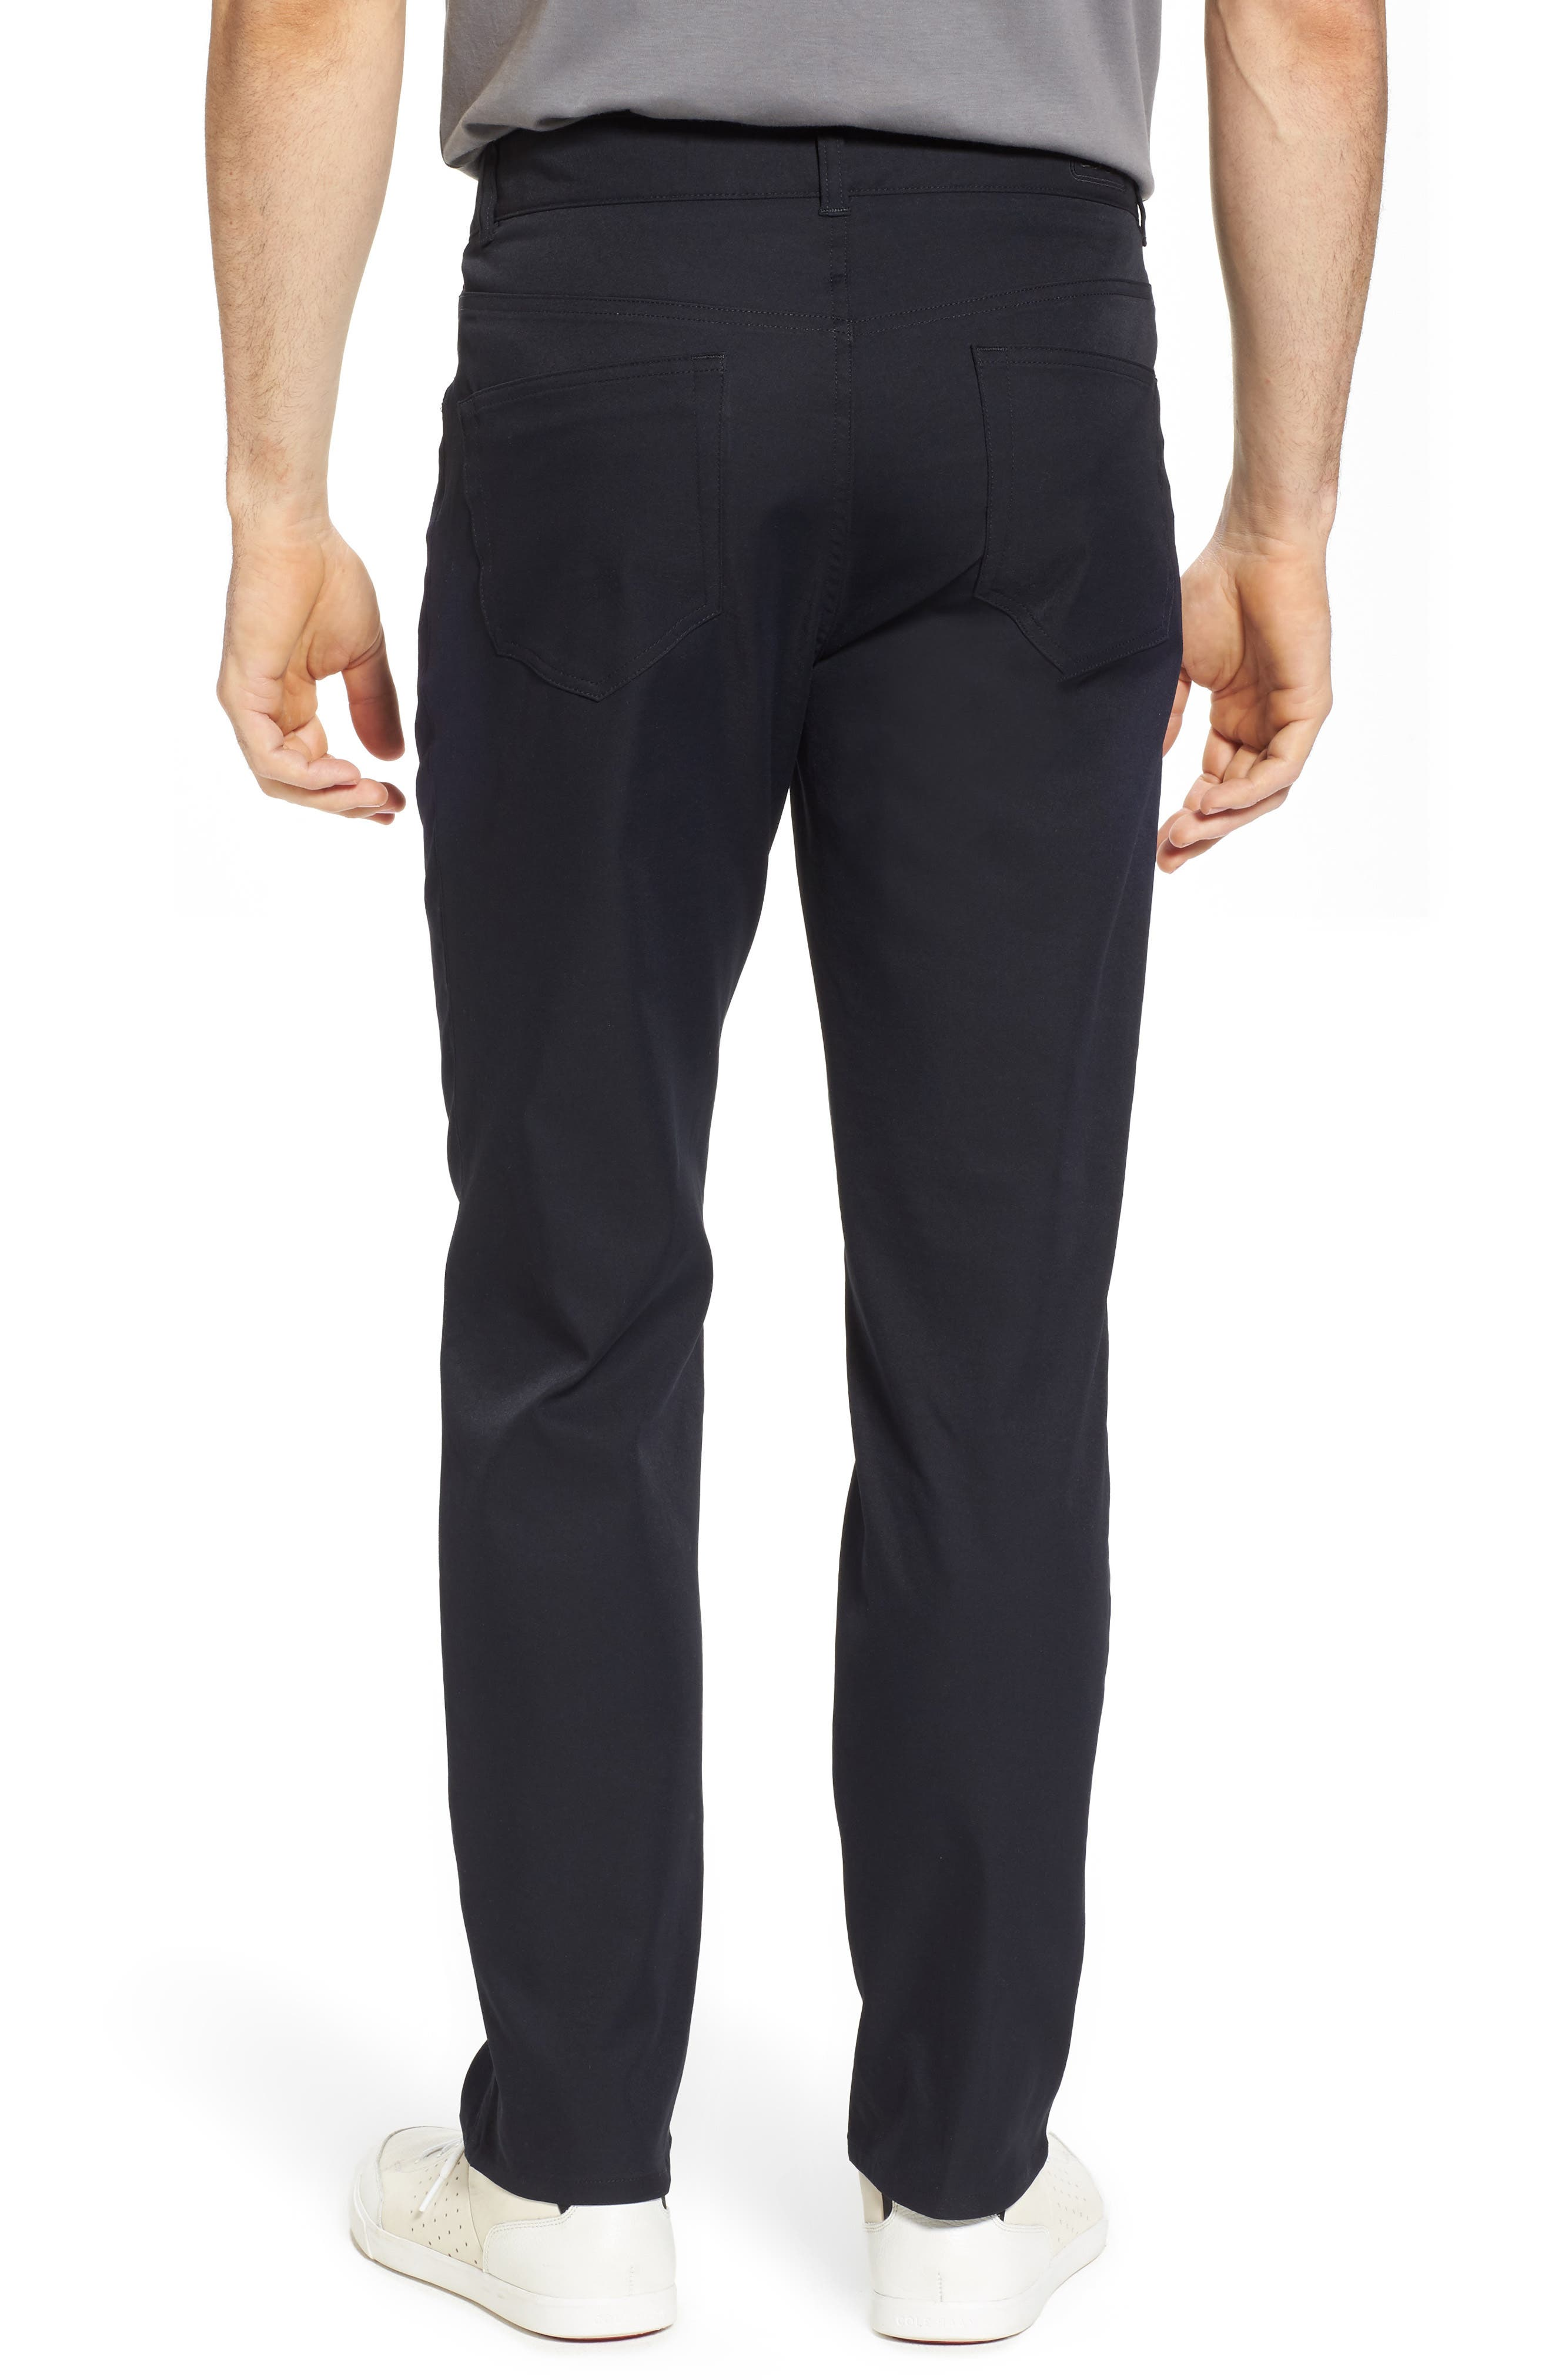 EB66 Performance Six-Pocket Pants,                             Alternate thumbnail 2, color,                             001